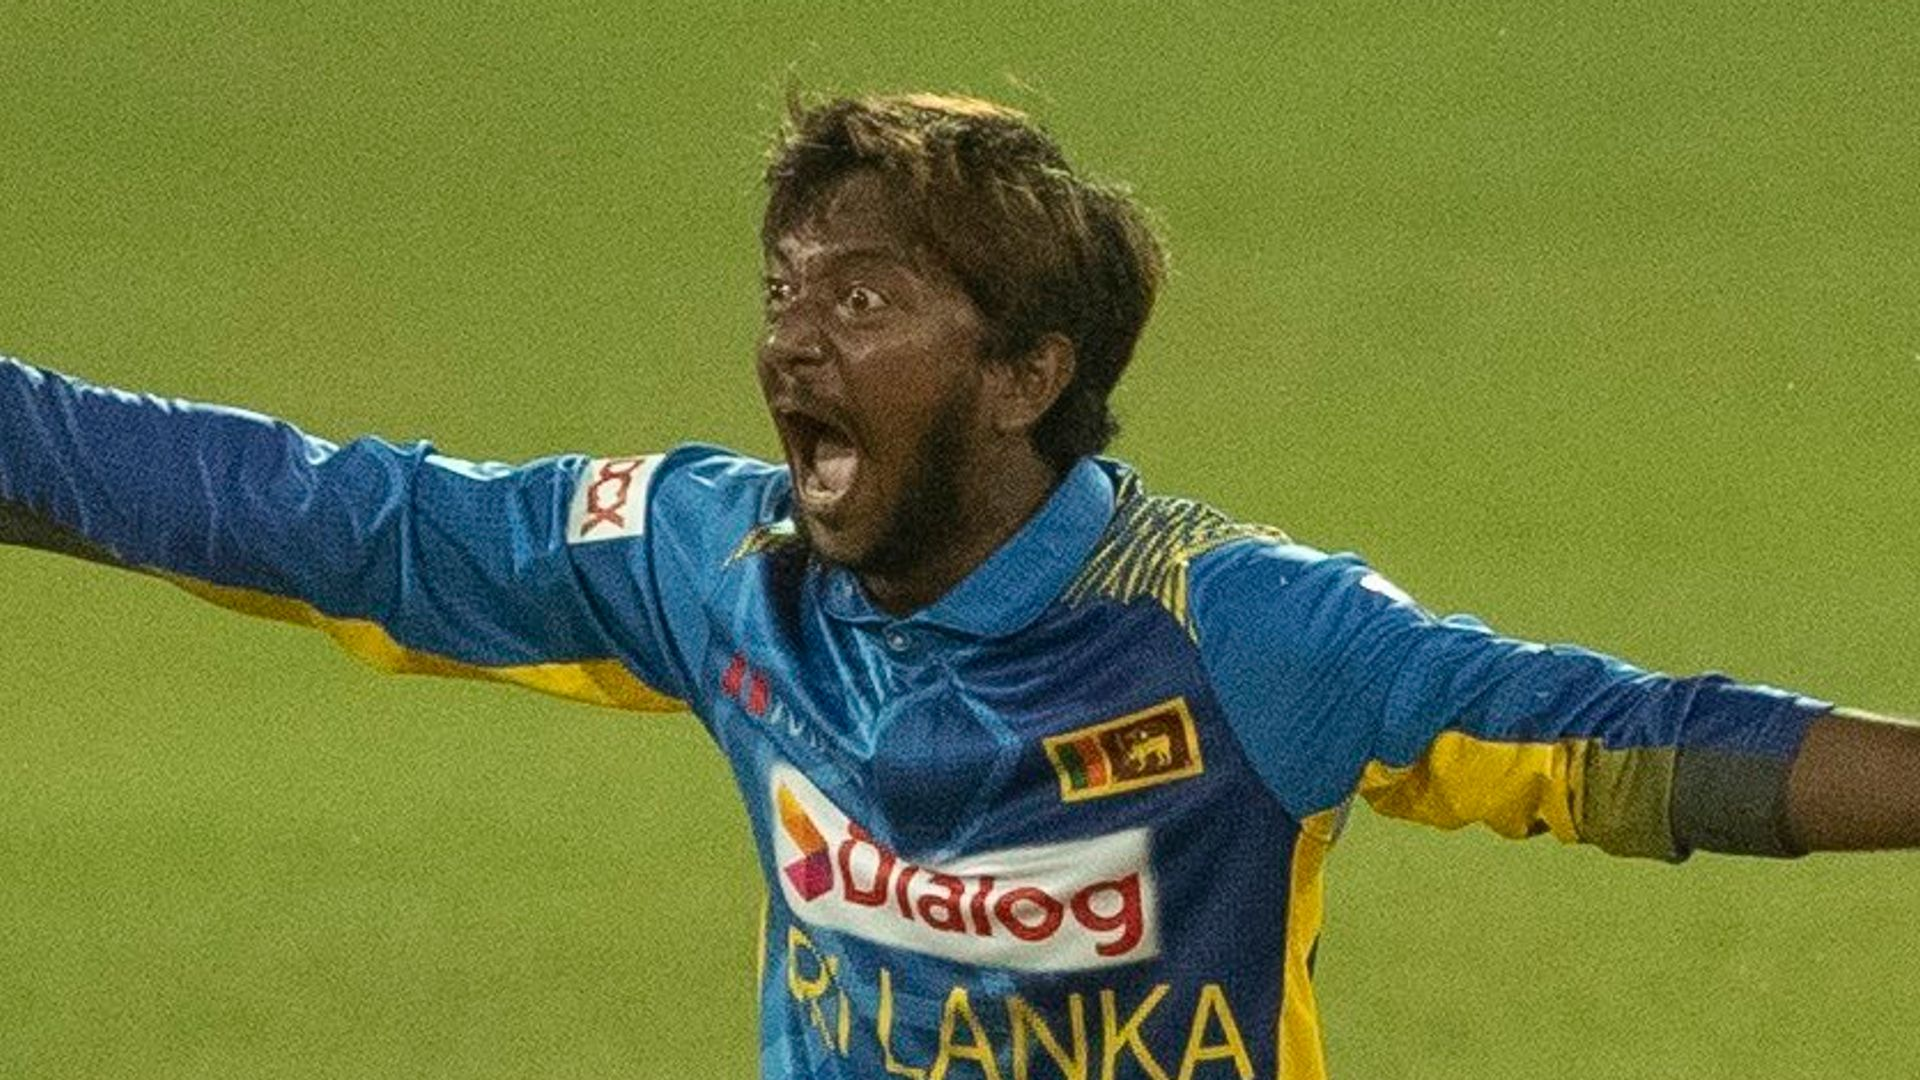 Sri Lanka beat India to avoid ODI whitewash - sky sports